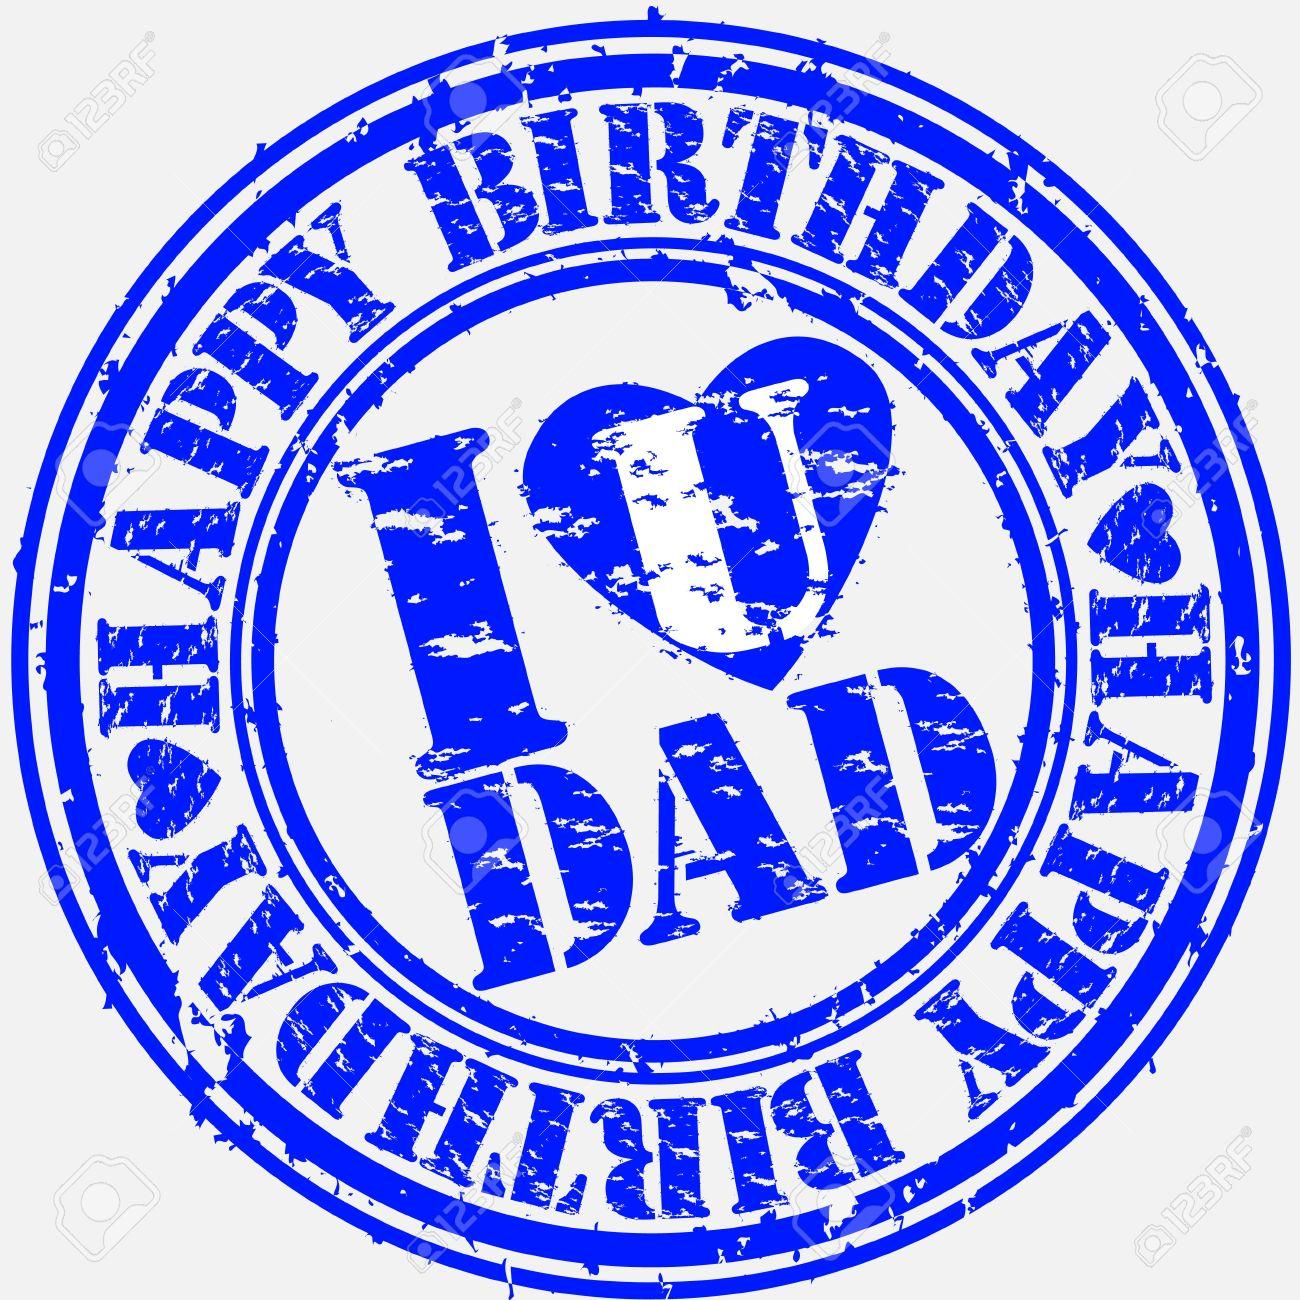 Grunge happy birthday dad, vector illustration Stock Vector - 13610789